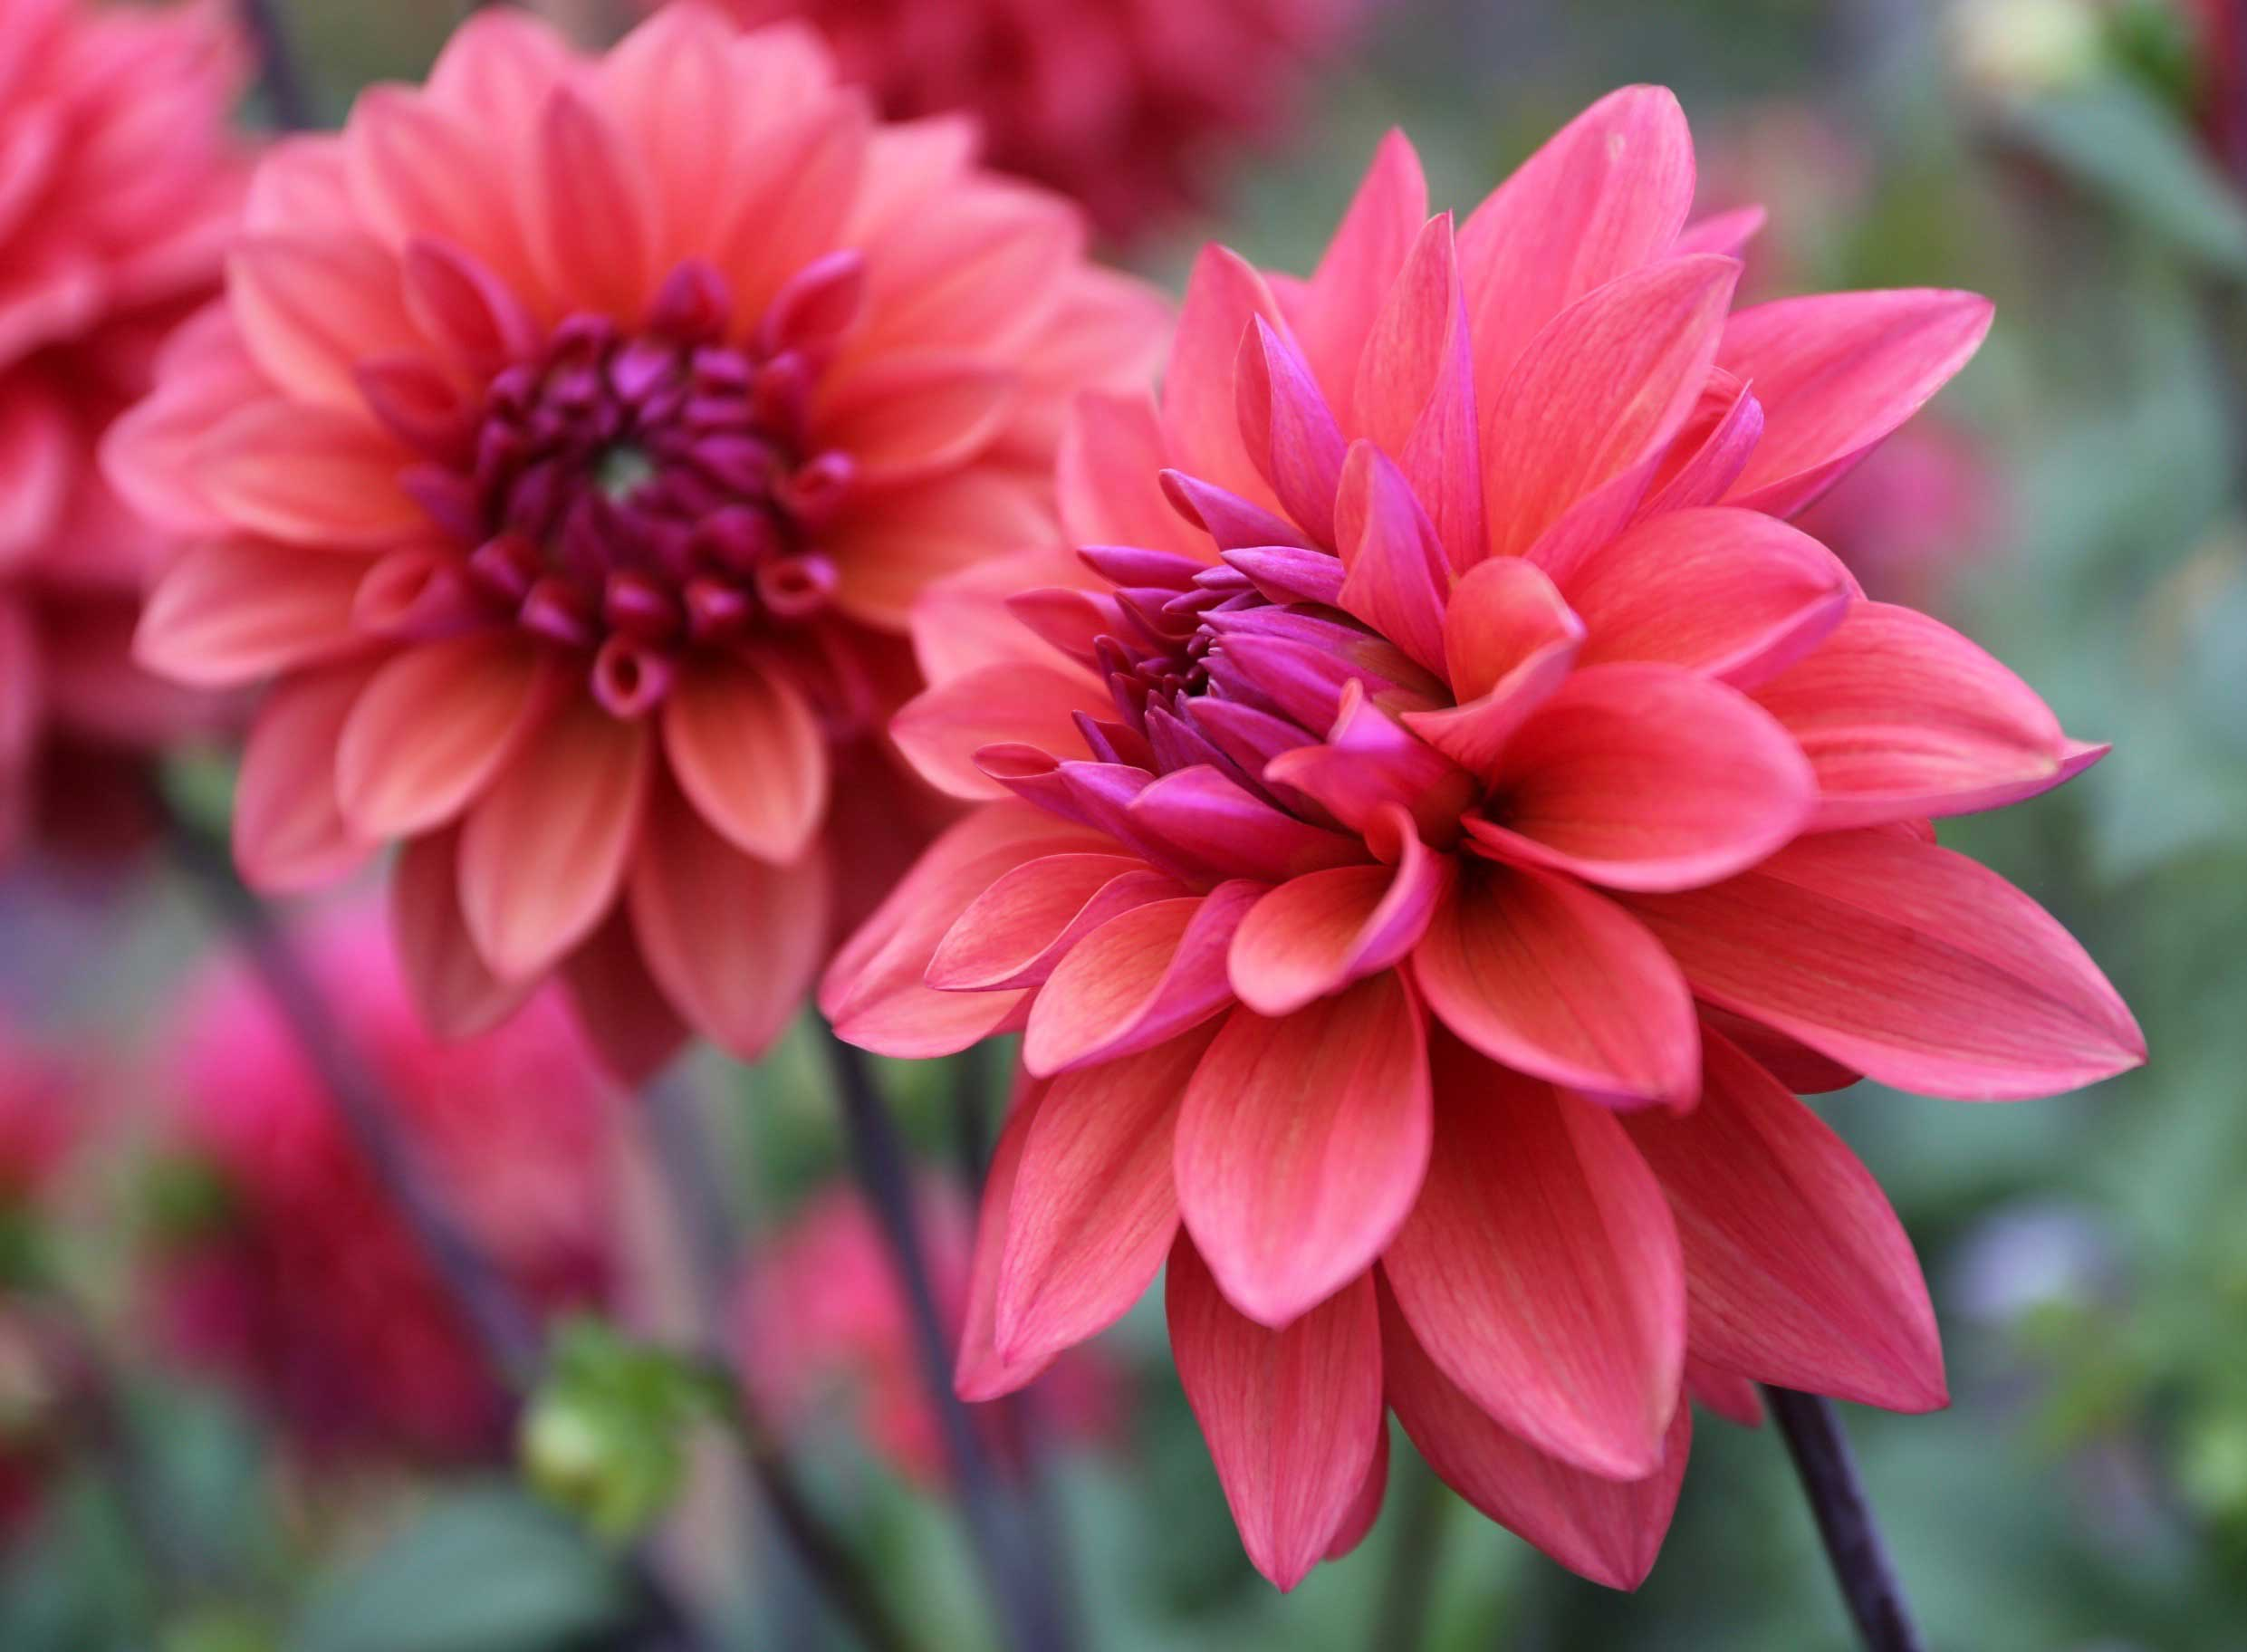 8 Tips for Growing Better Dahlias - Longfield-Gardens